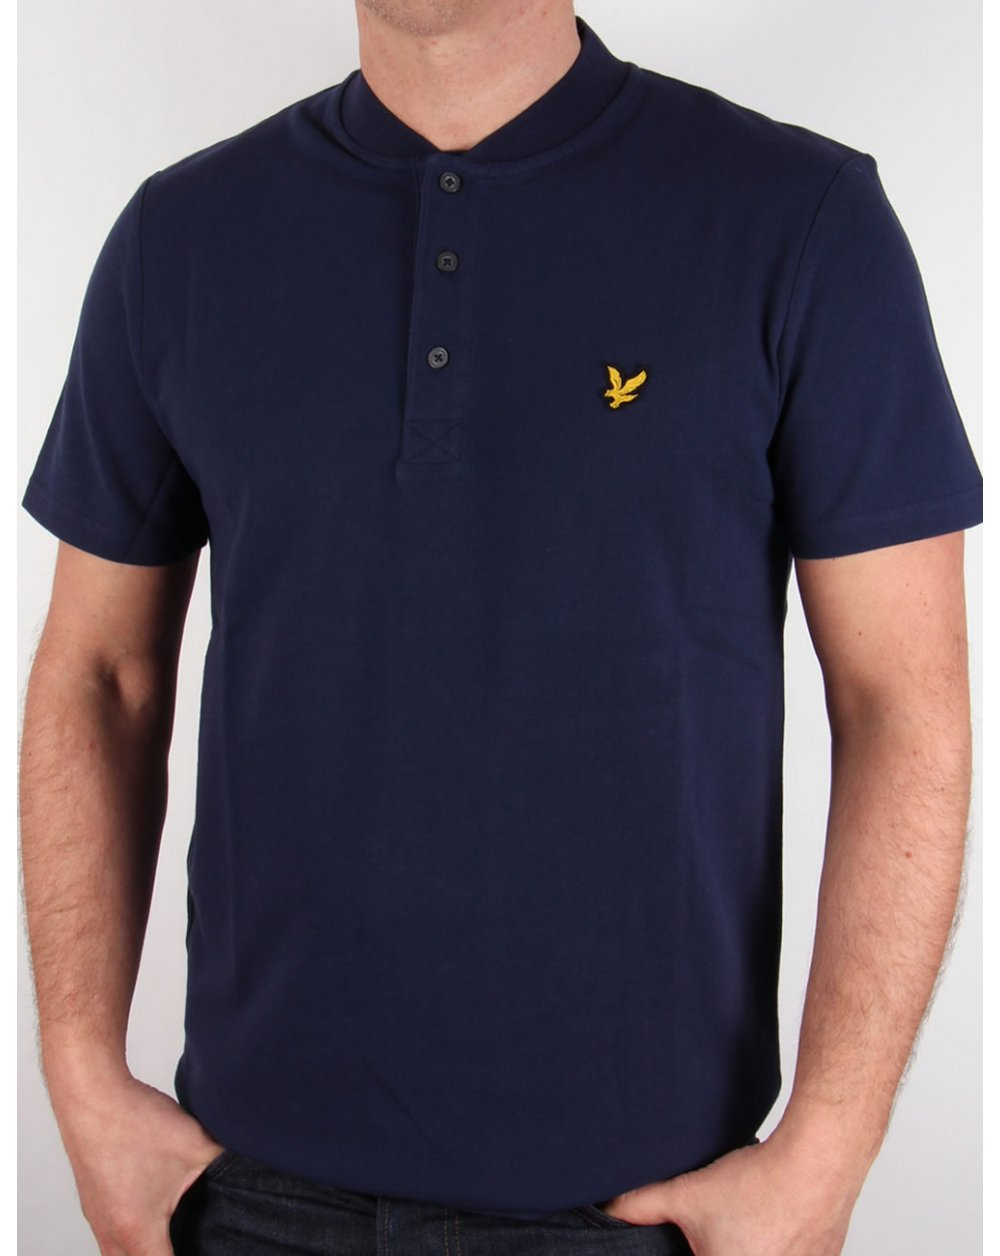 Lyle And Scott Bomber Collar Polo Shirt Navy Blue Neck